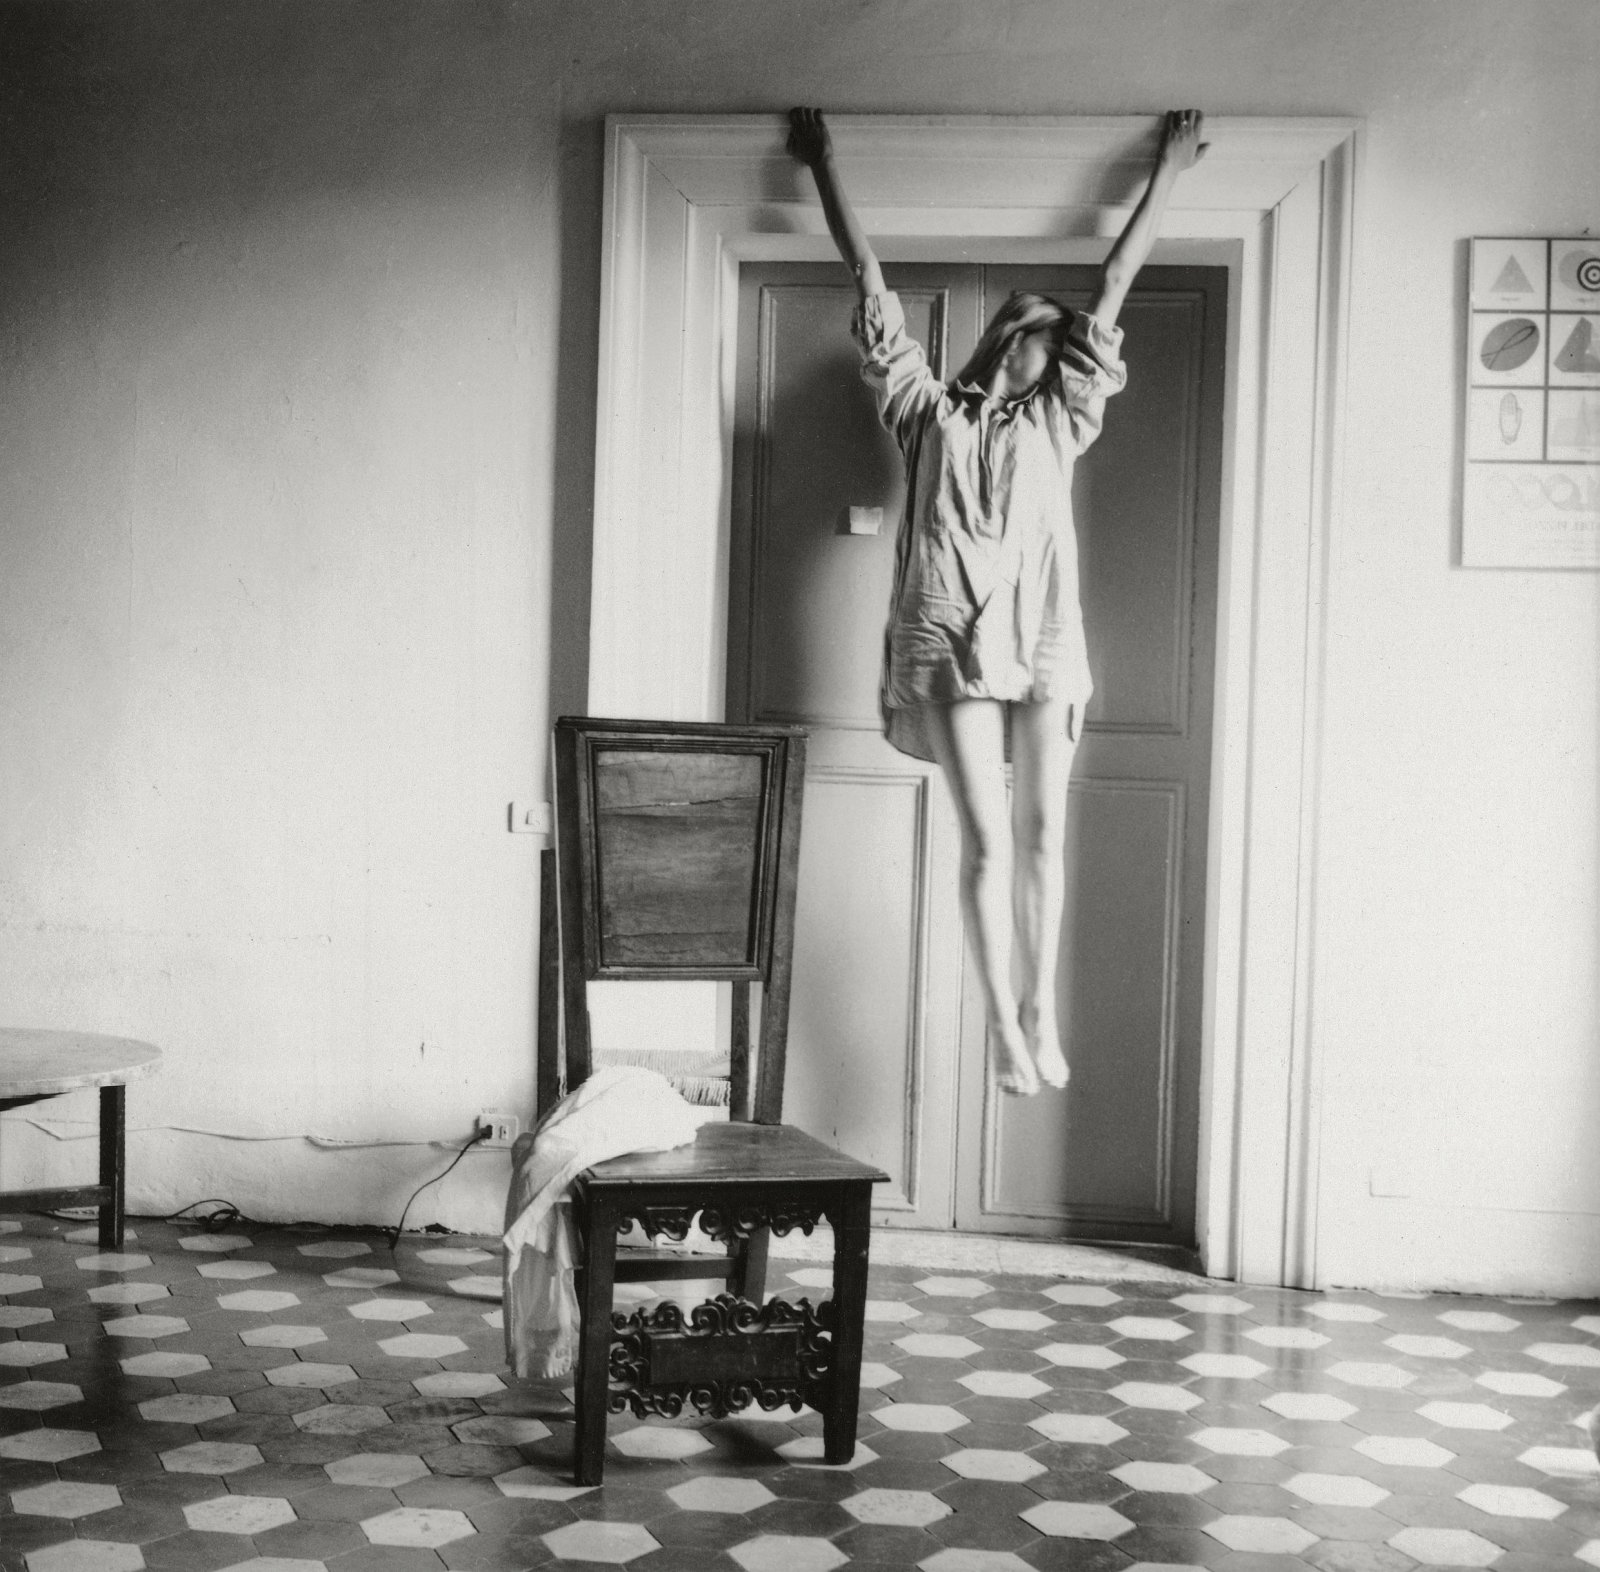 Francesca Woodman, Untitled, Rome, Italy, 1977-78 © George and Betty Woodman